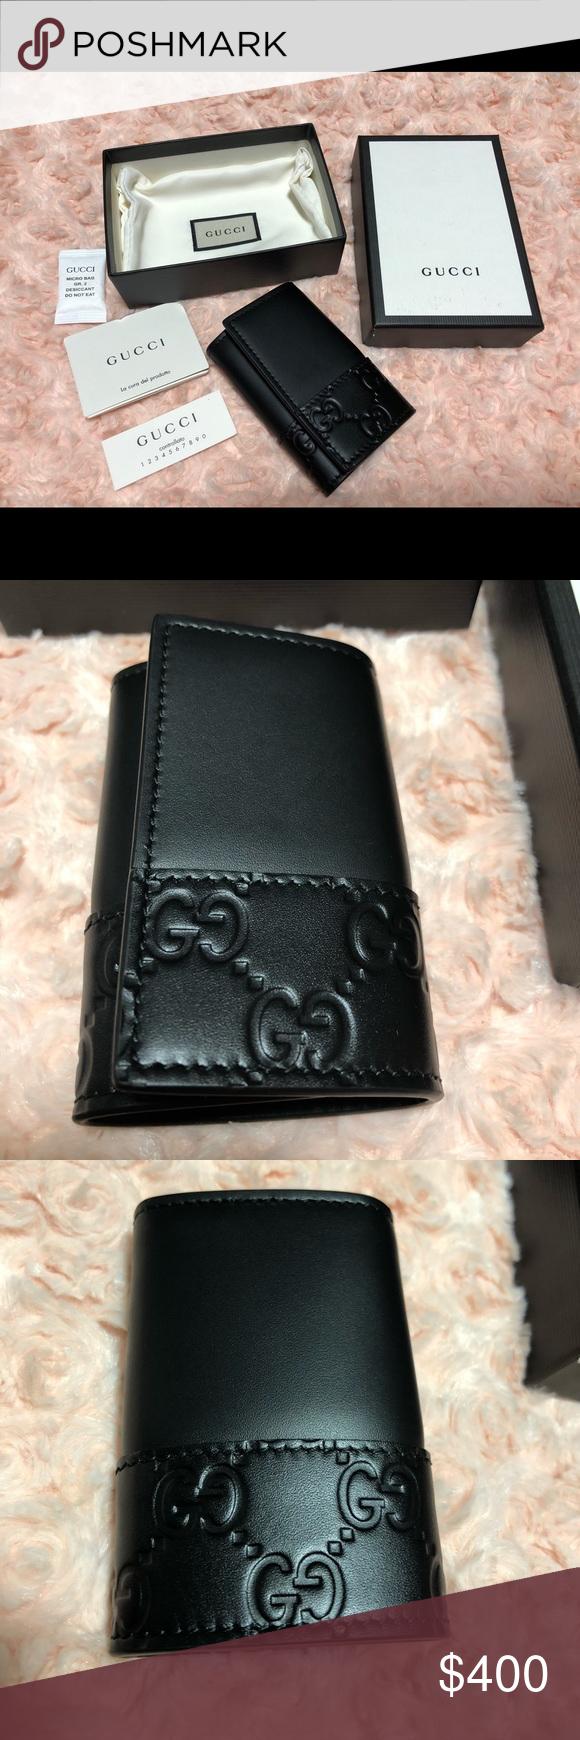 92859a1bebf 🆕 GUCCI Key Holder Black Wallet Case GUCCISSIMA NWT